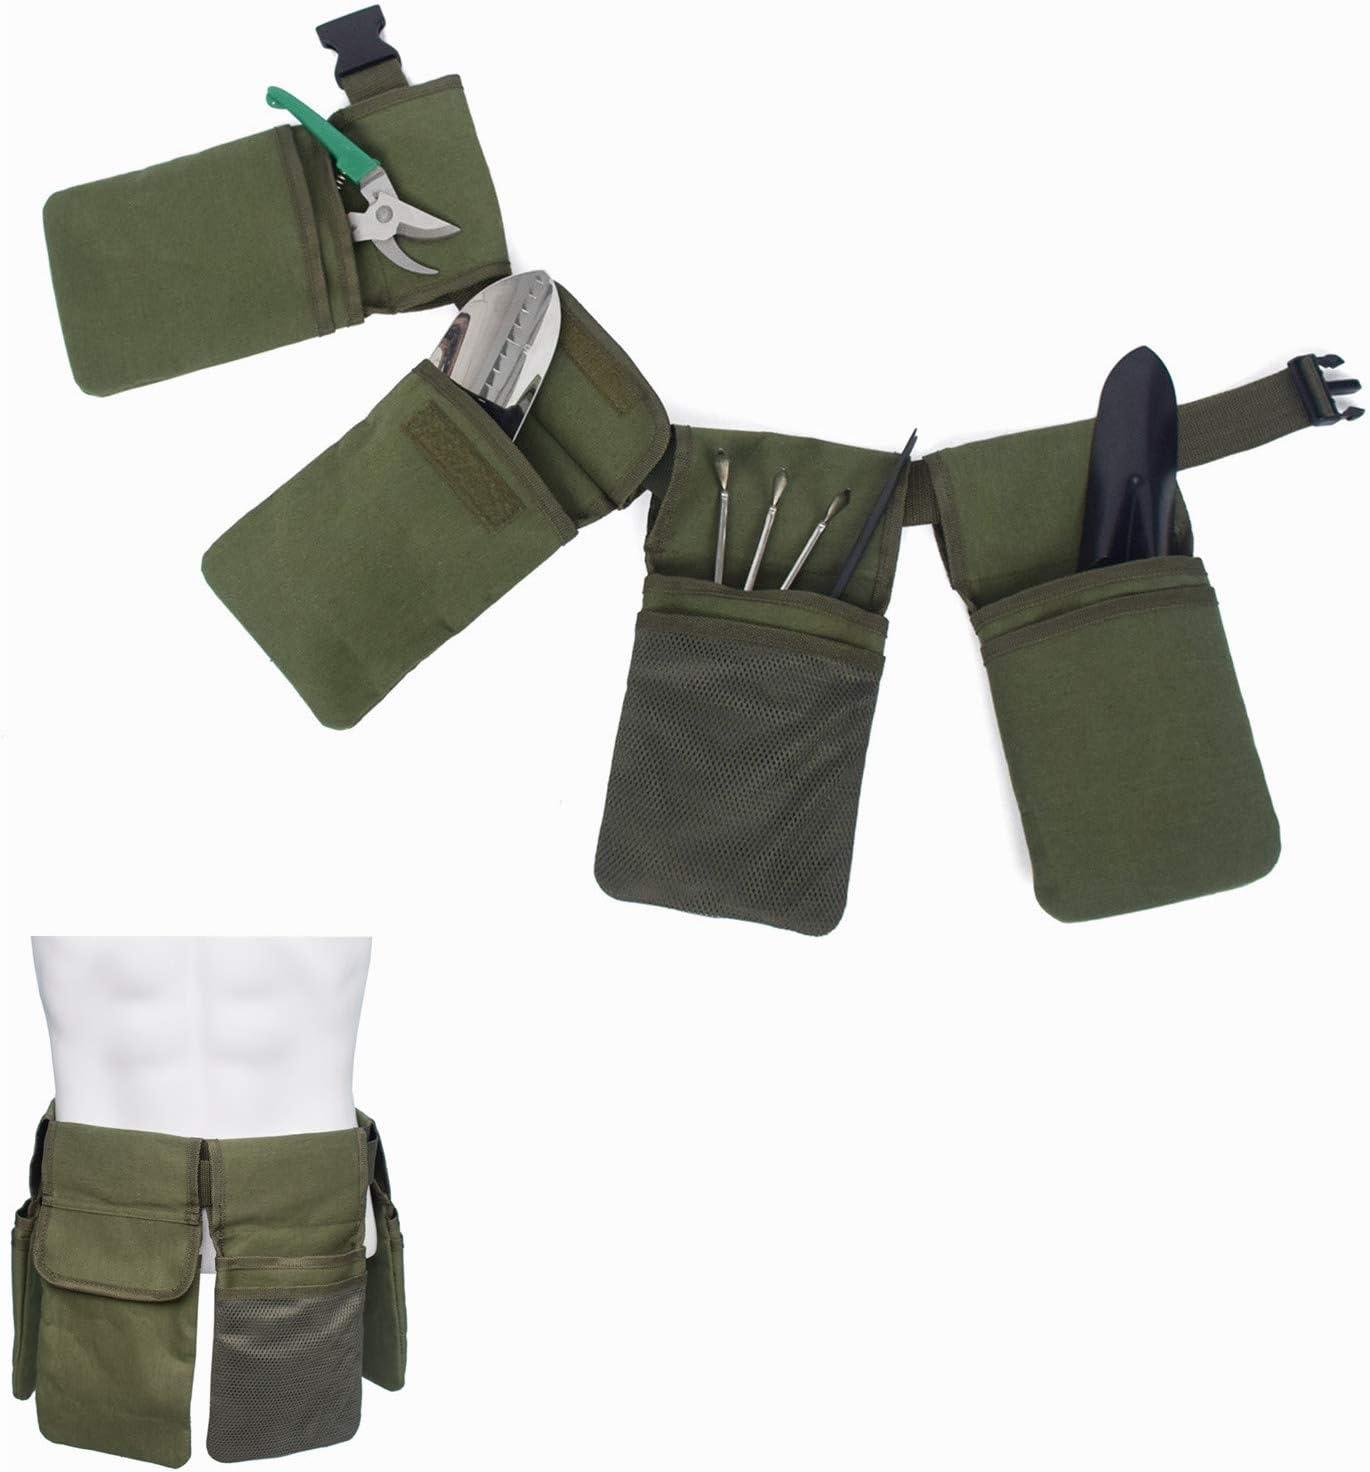 Canvas Tool Belt For Women Garden Side Inventory cleanup selling sale Apron Adjus Over item handling ☆ Single